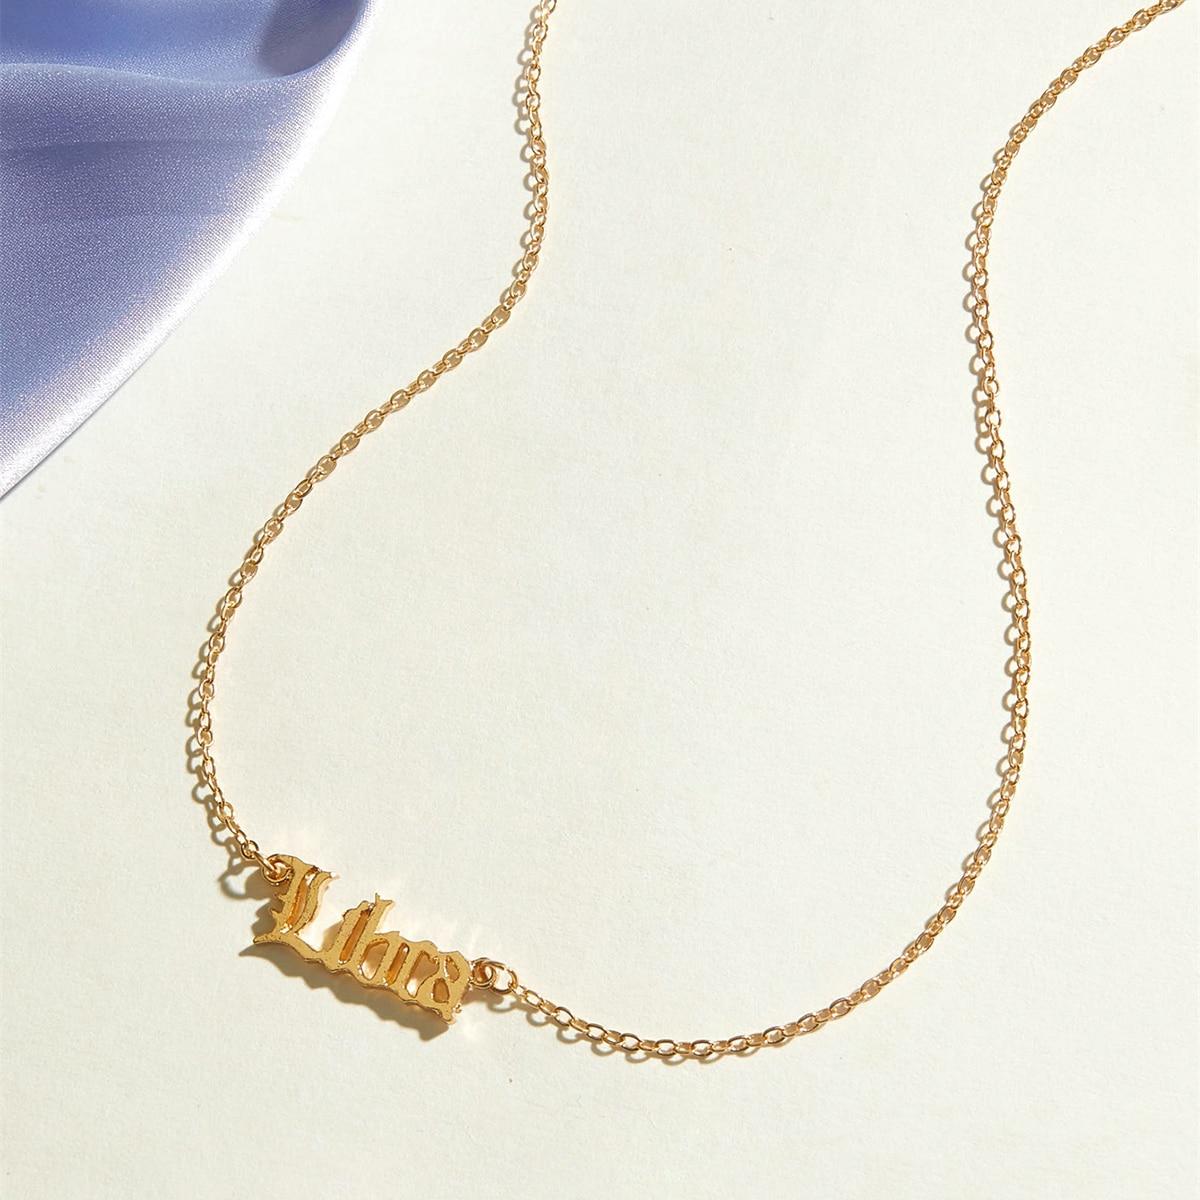 SHEIN / 1pc Waage Charm Halskette